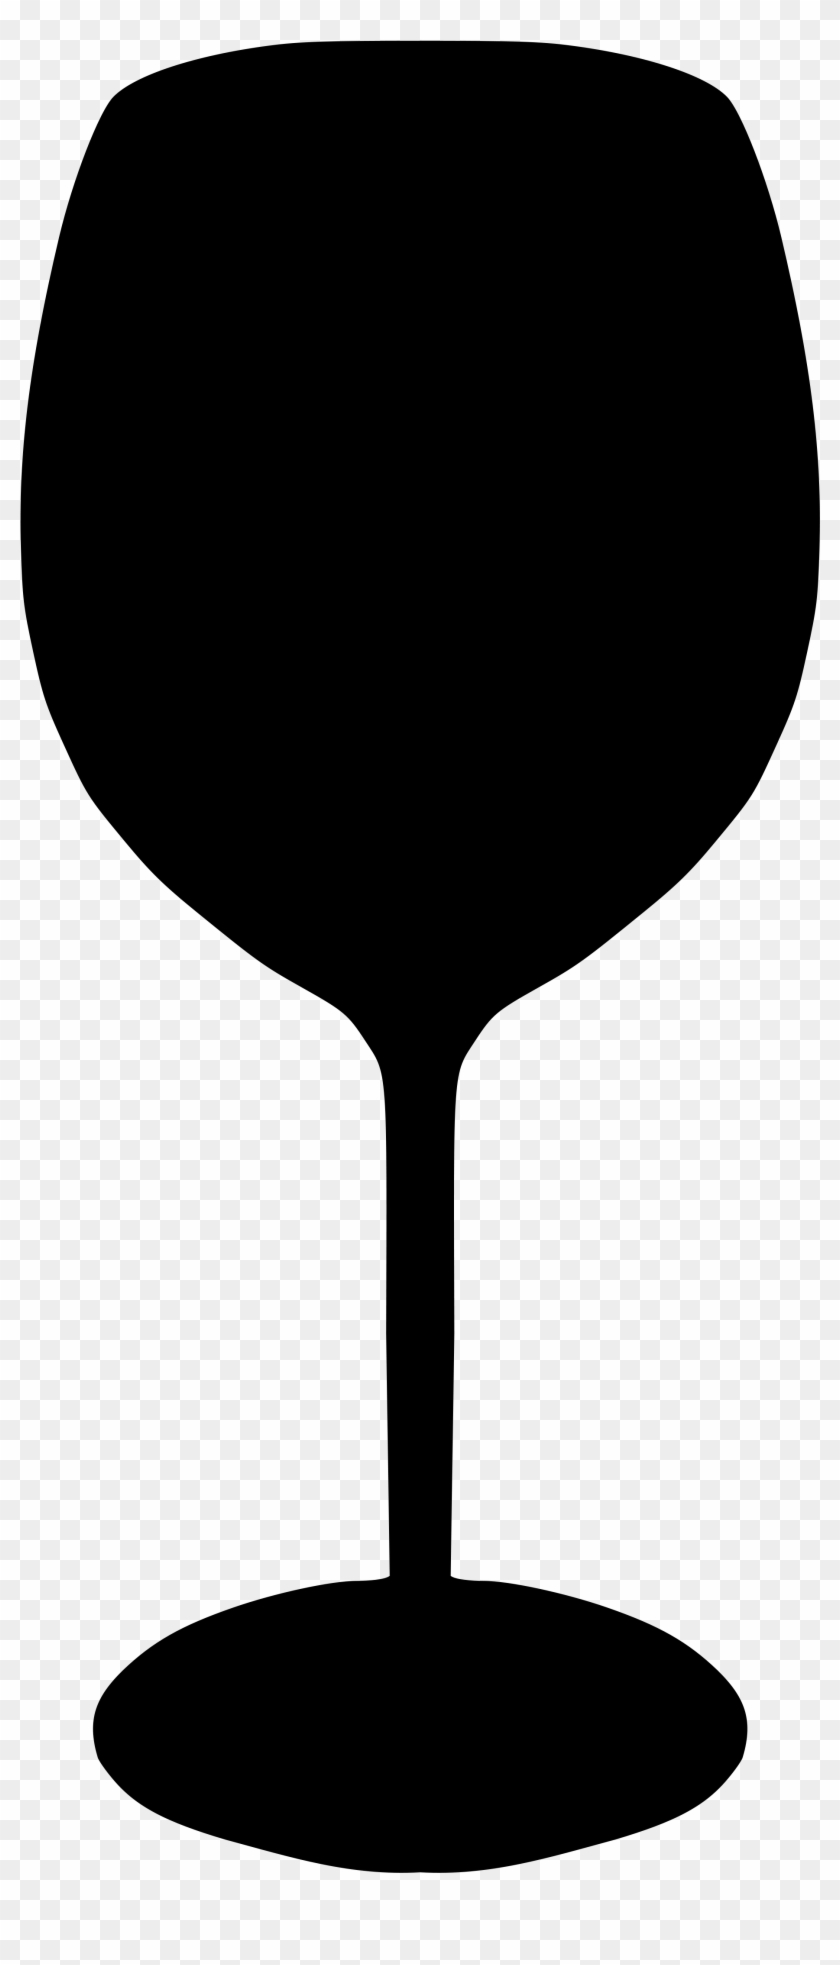 Filewineglass - Svg - Wine Glass Svg File Free #96587